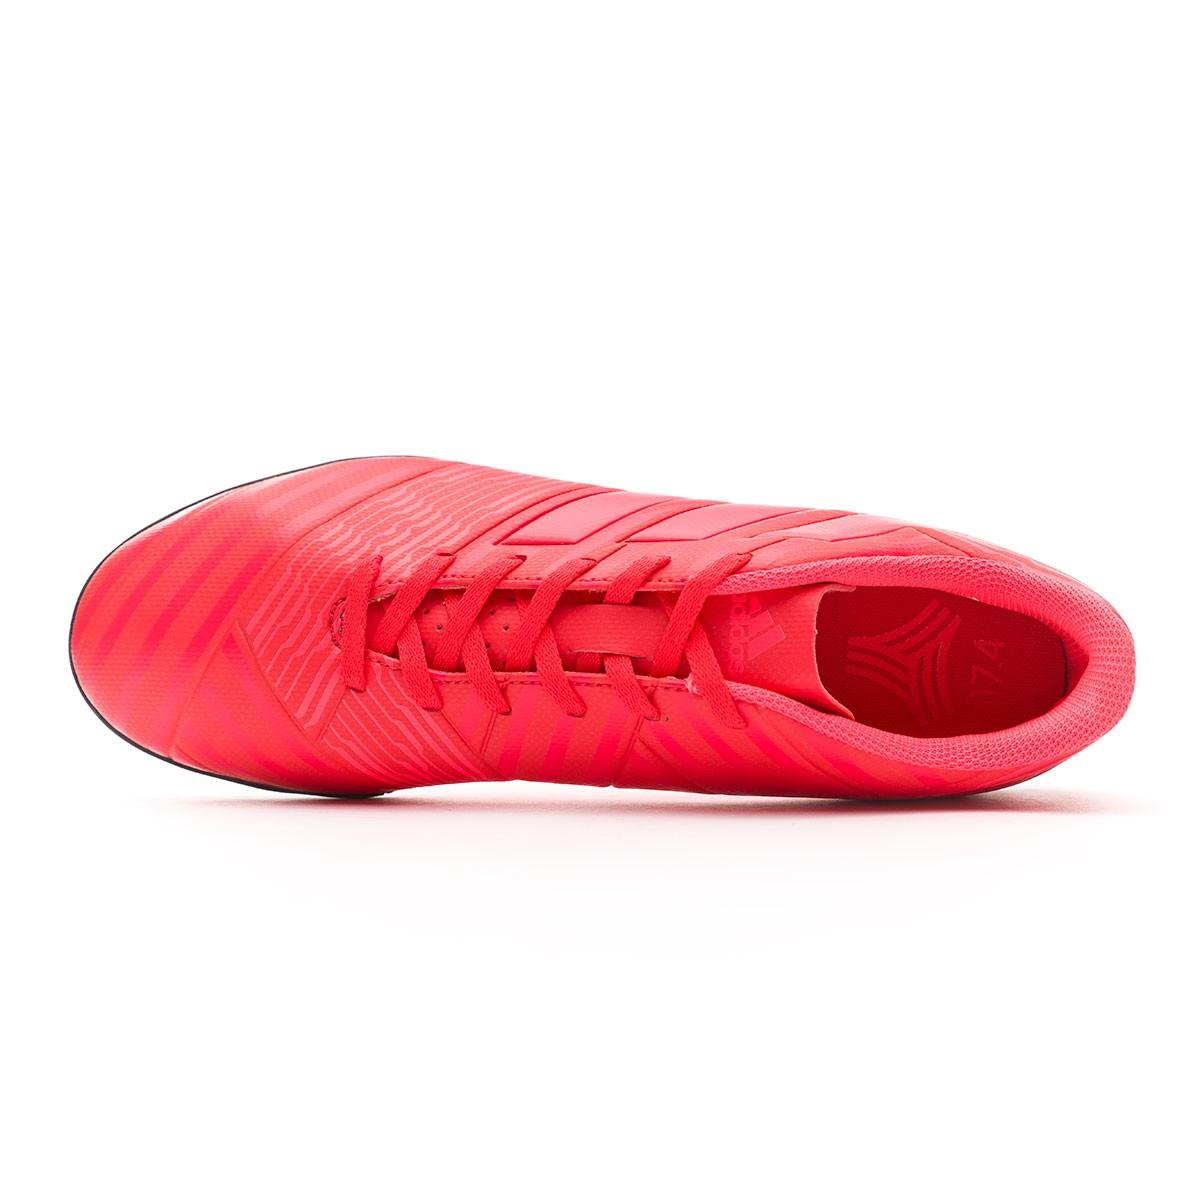 8fa73127f37d Football Boot adidas Nemeziz Tango 17.4 Turf Real coral-Red zest-Core black  - Tienda de fútbol Fútbol Emotion